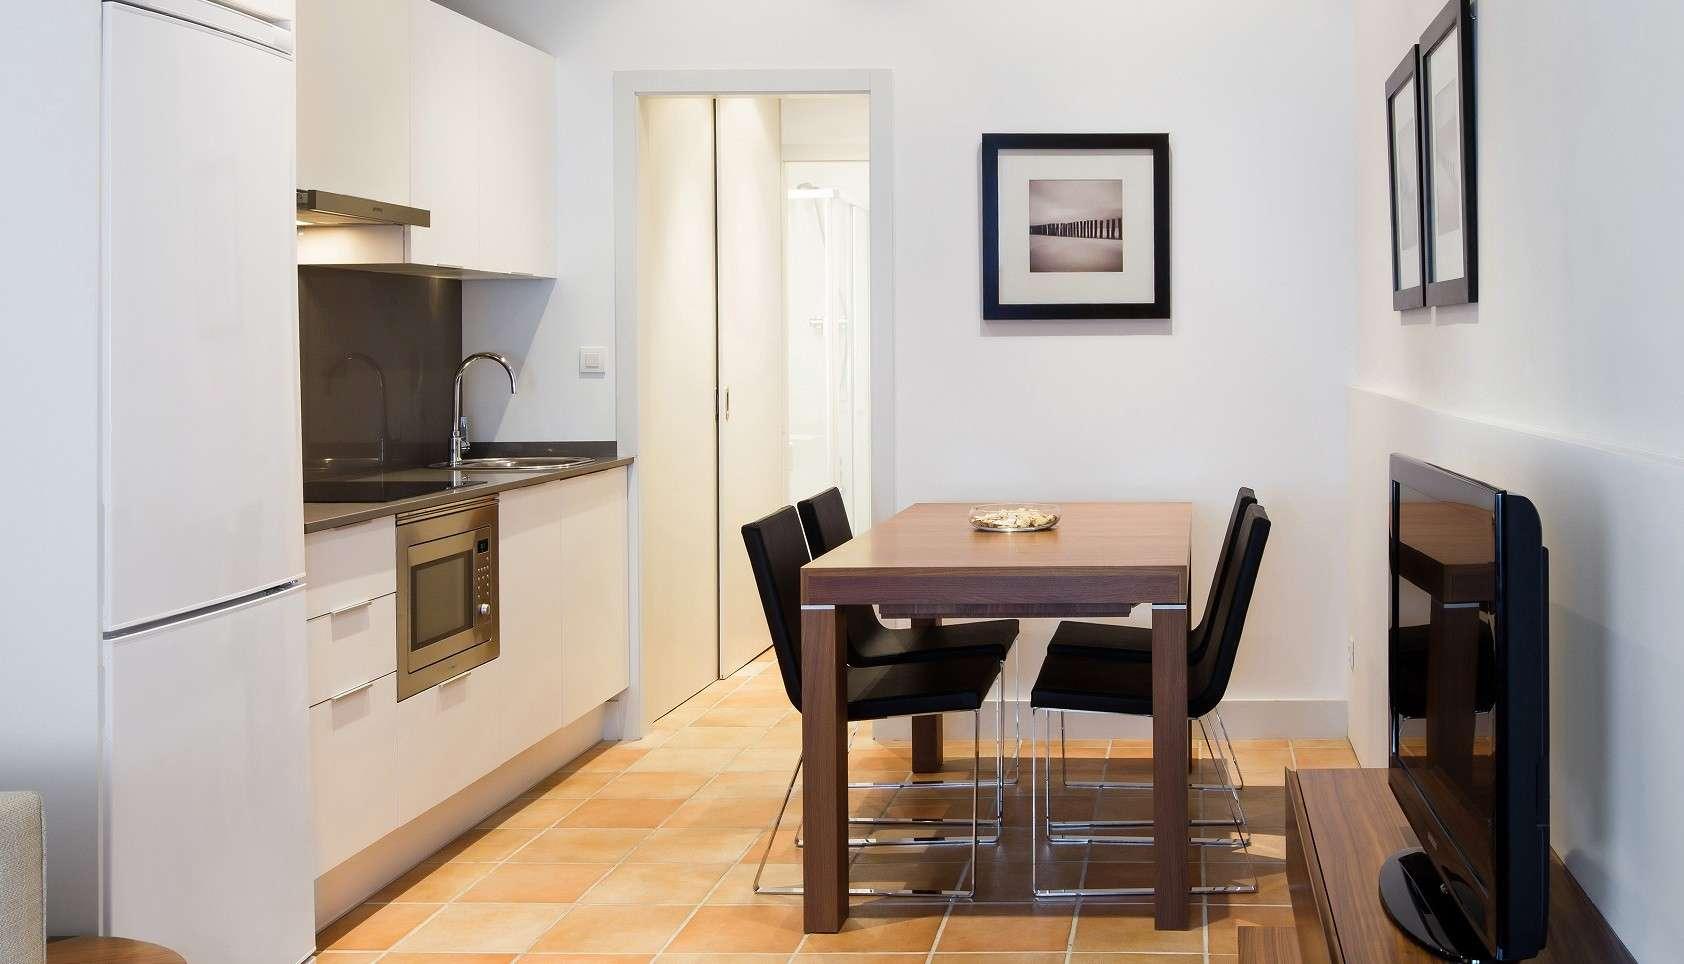 Dailyflats Sagrada Familia area Classic 1-bedroom (1-4 adults) apartments in Barcelona 3